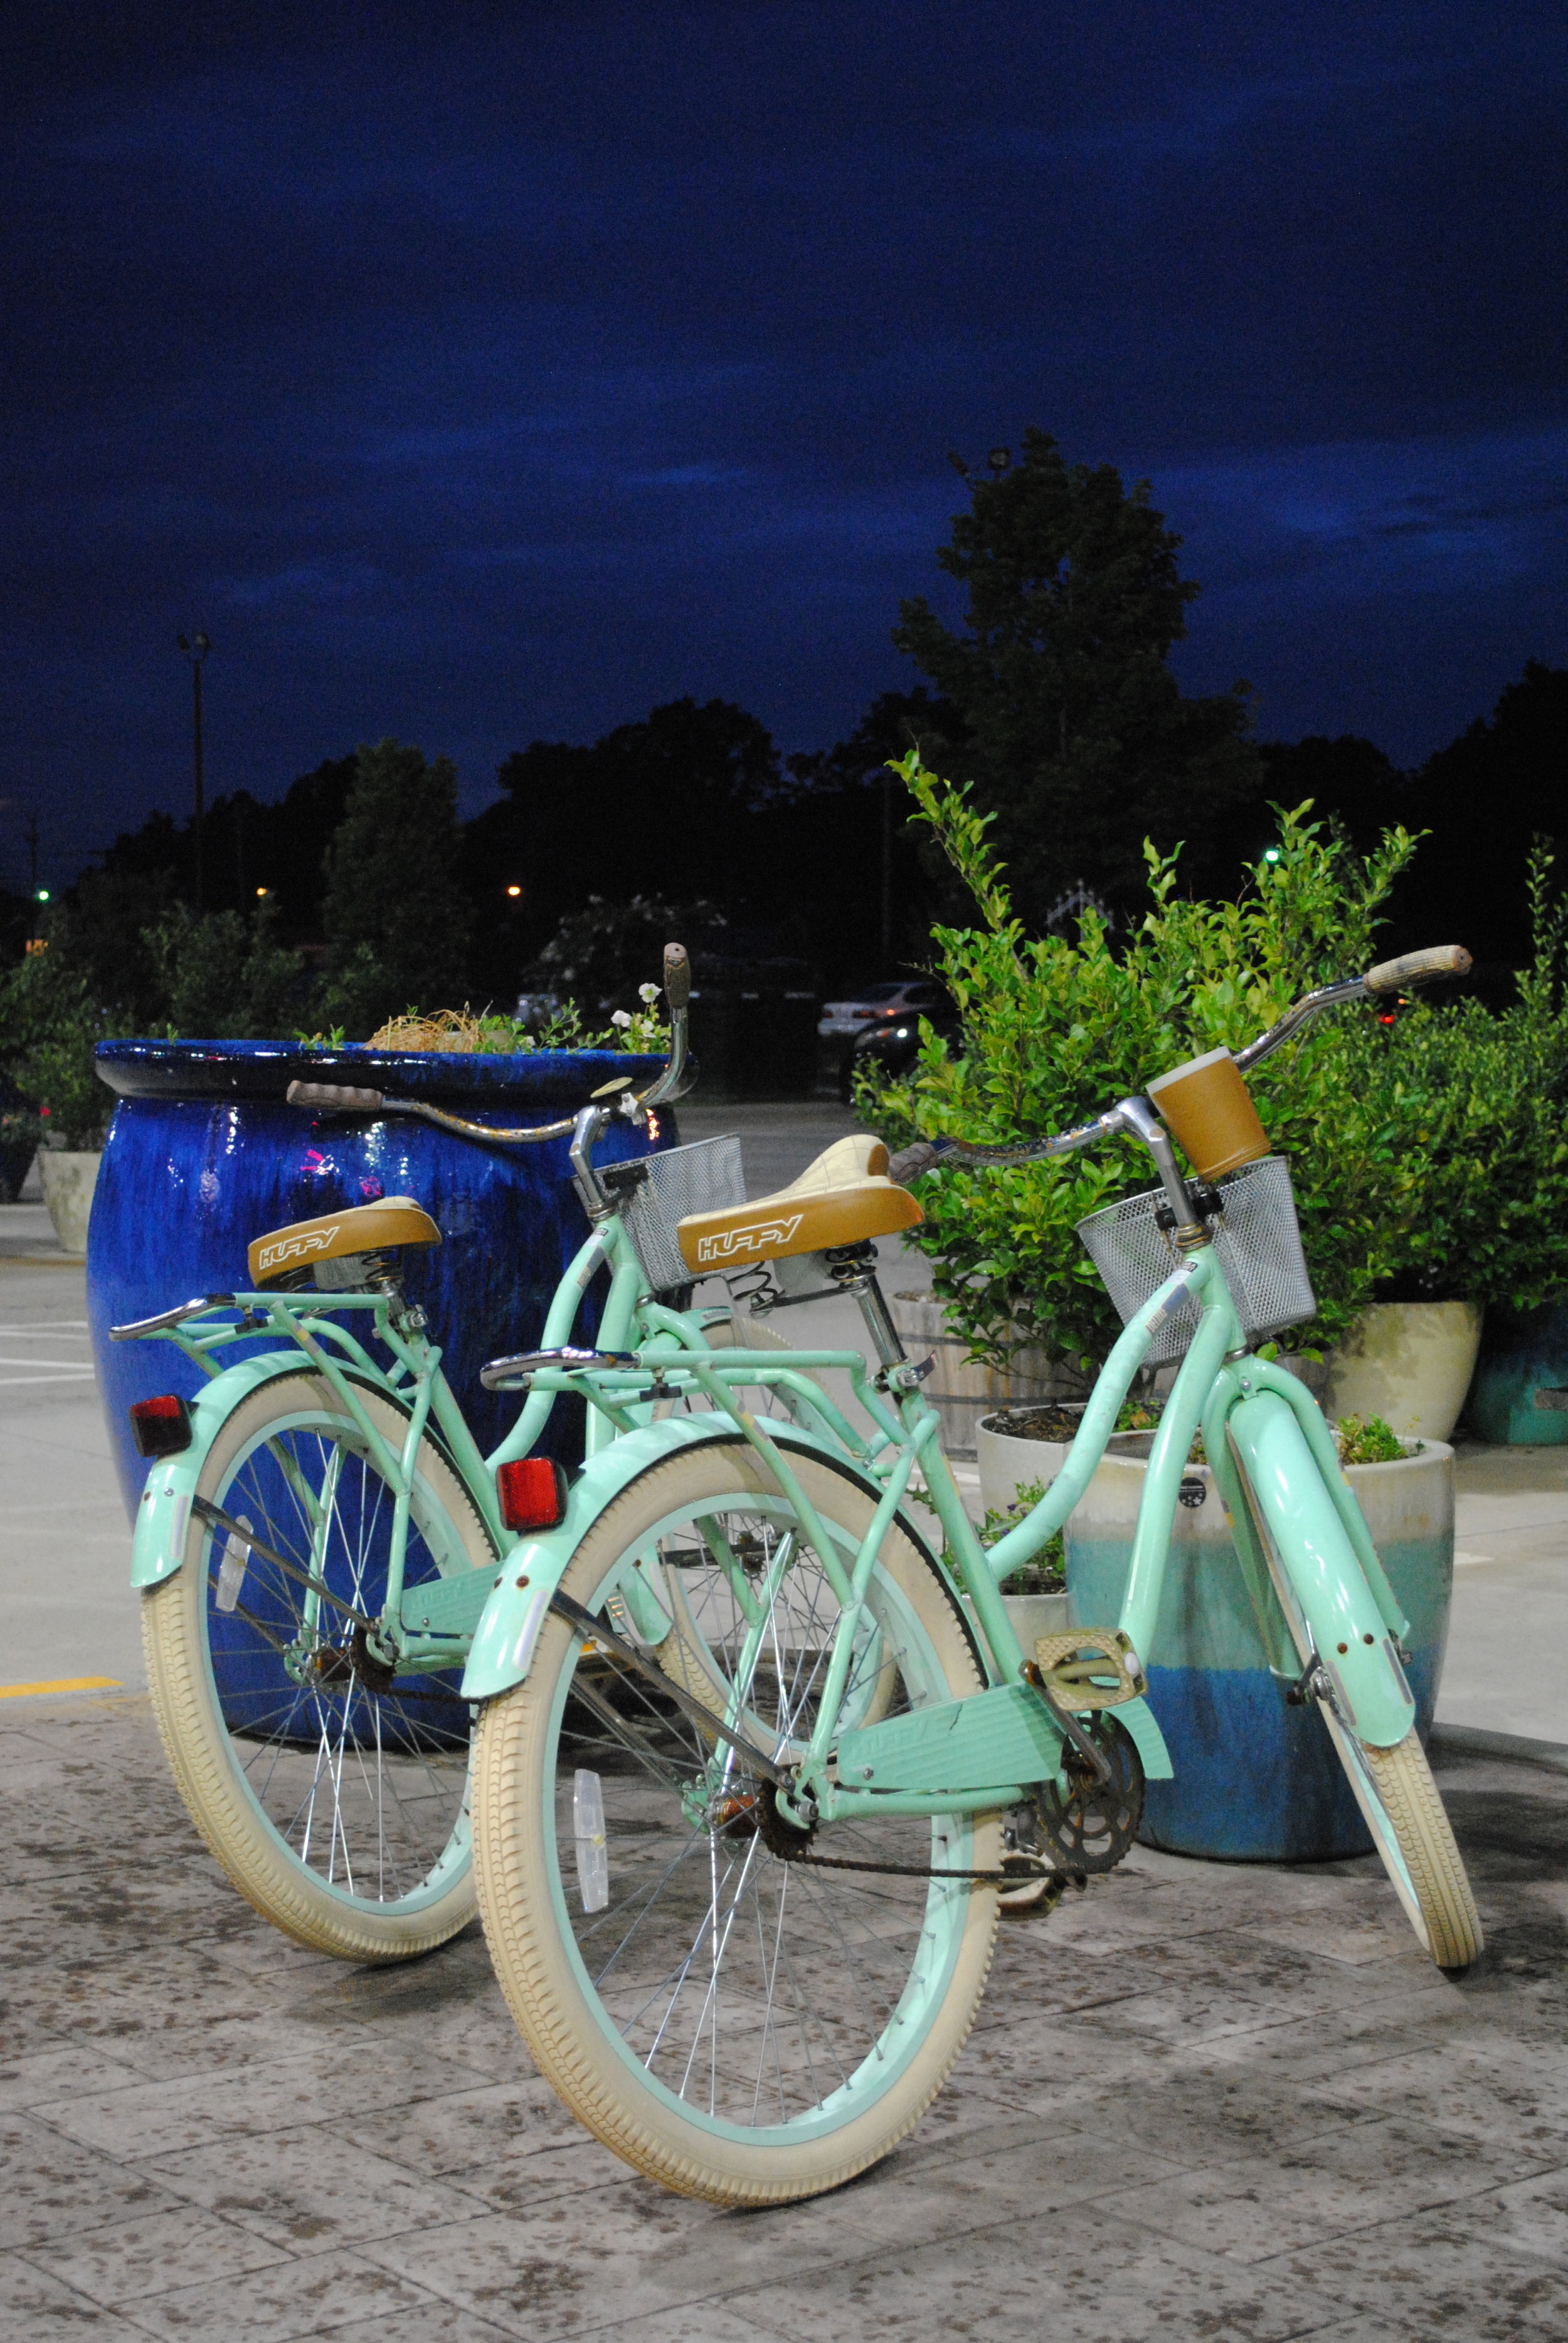 Decorative bikes feeling oh so European